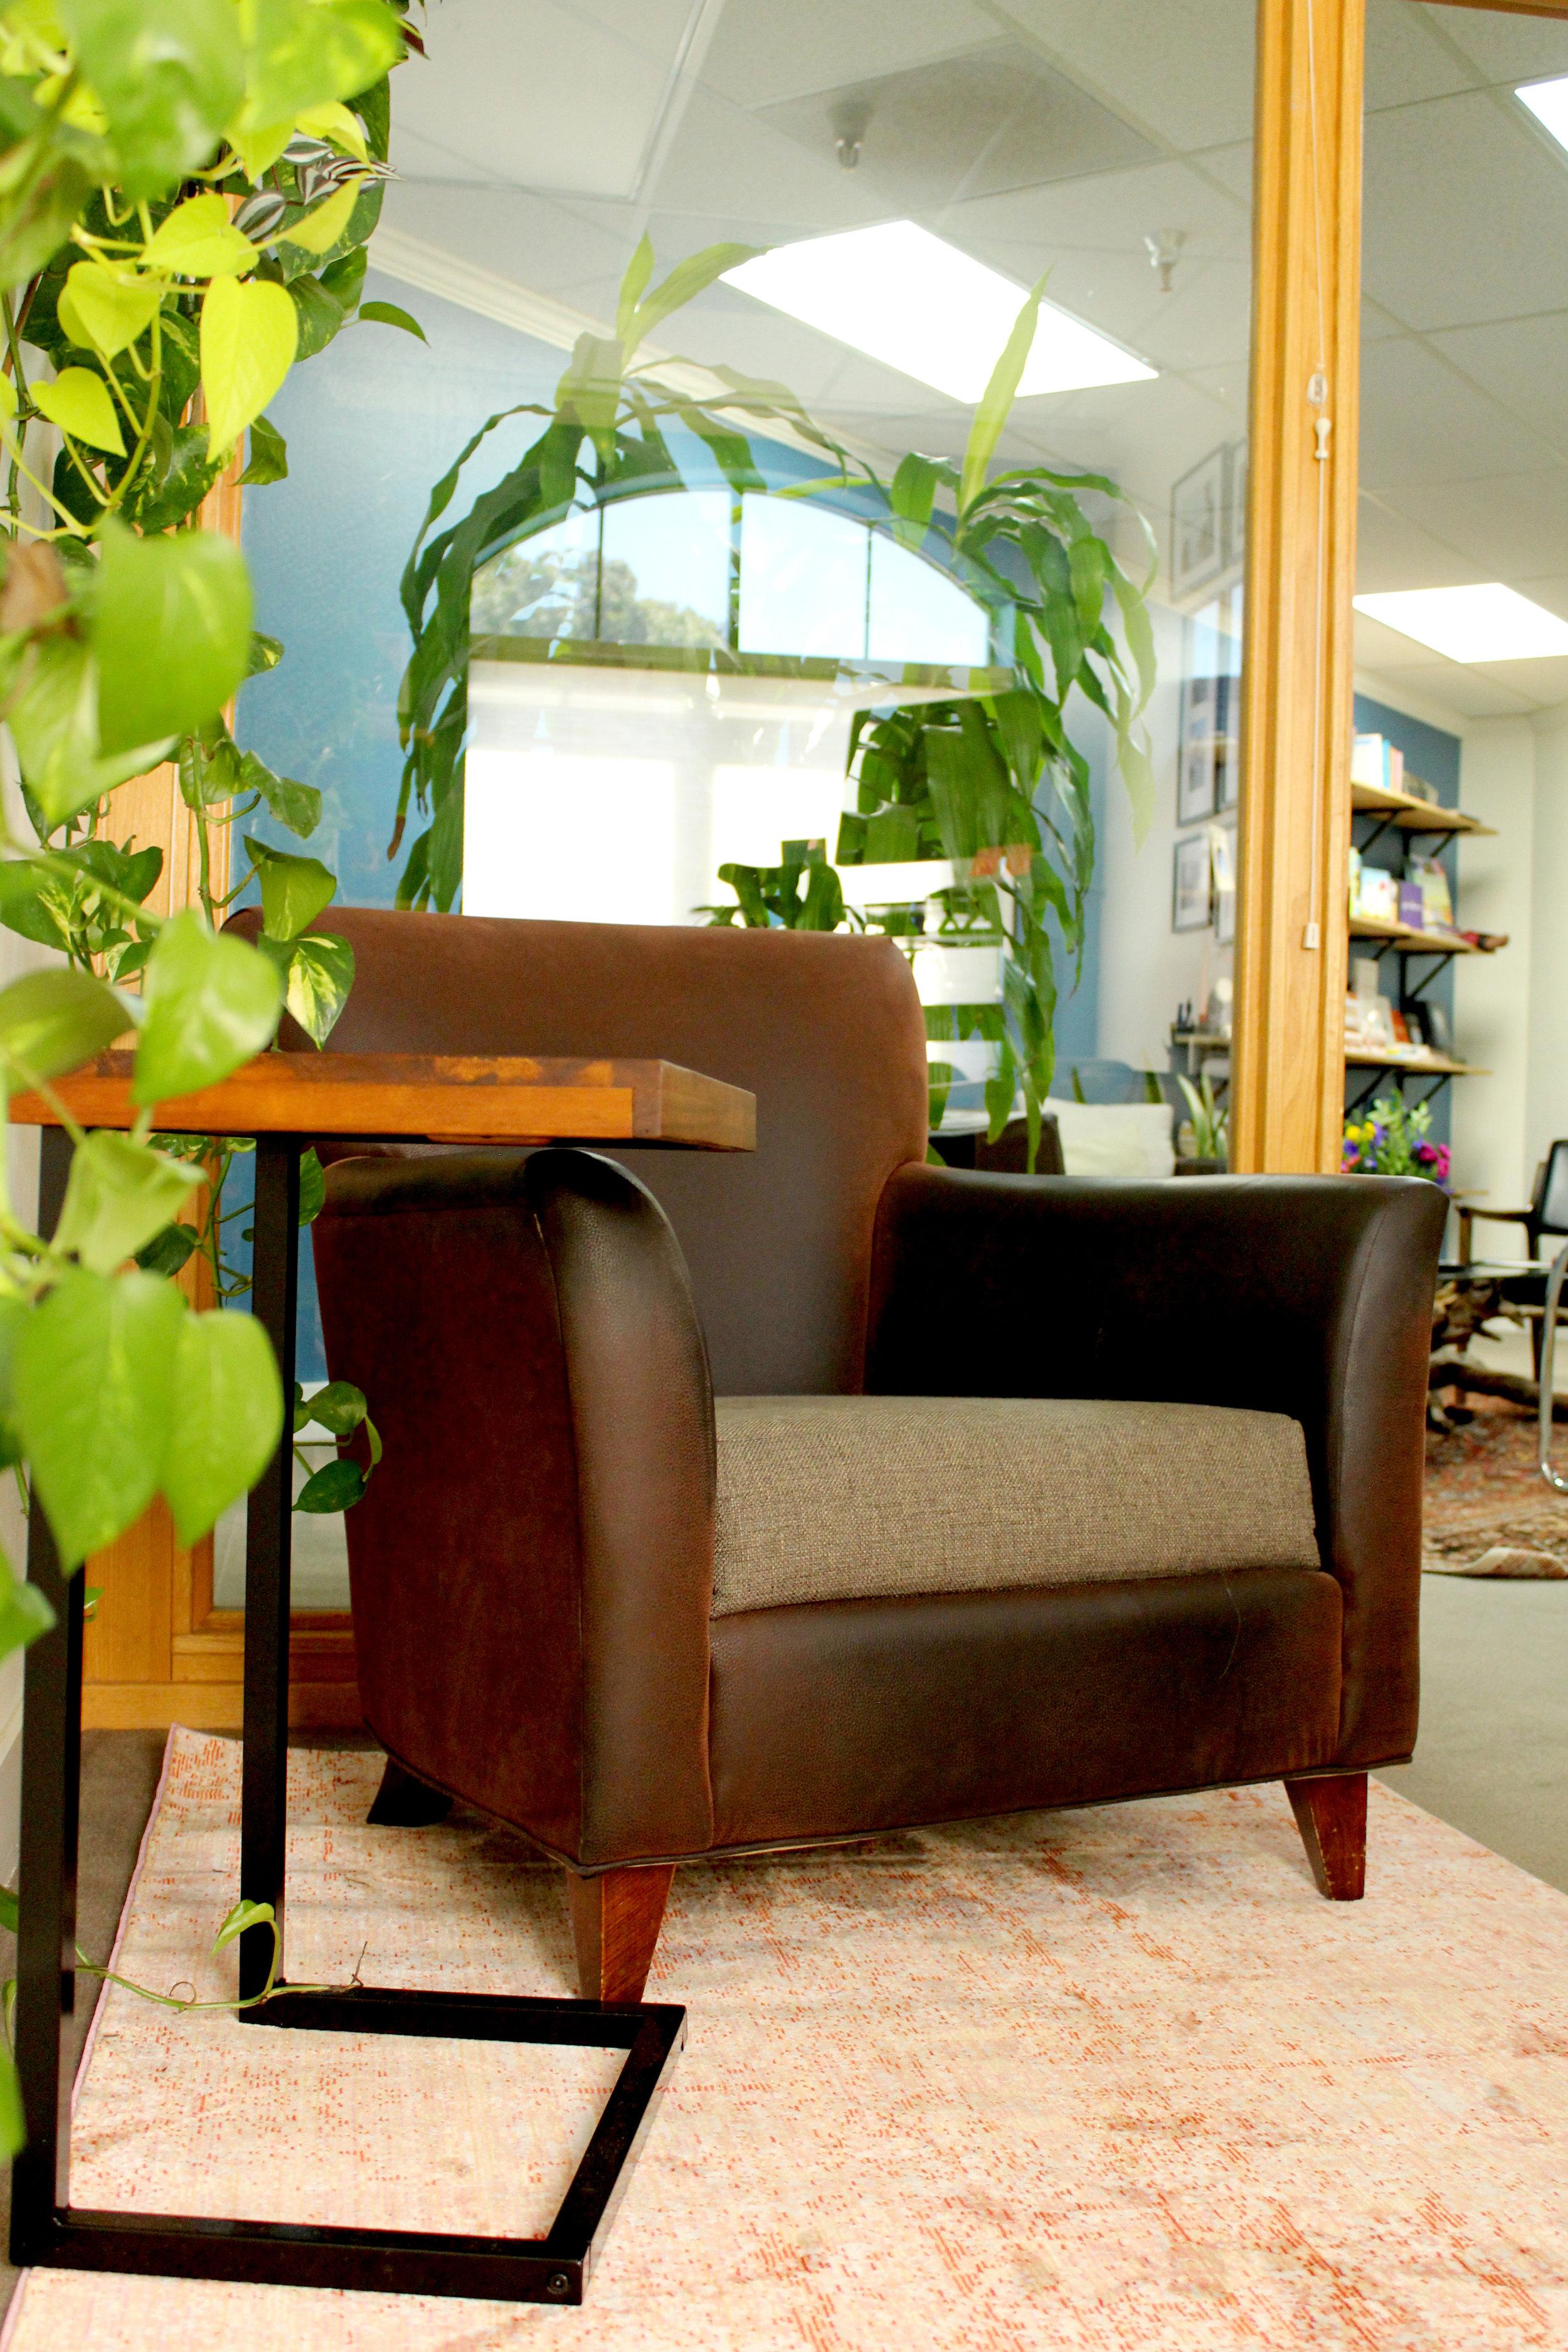 dougs office chair.jpg